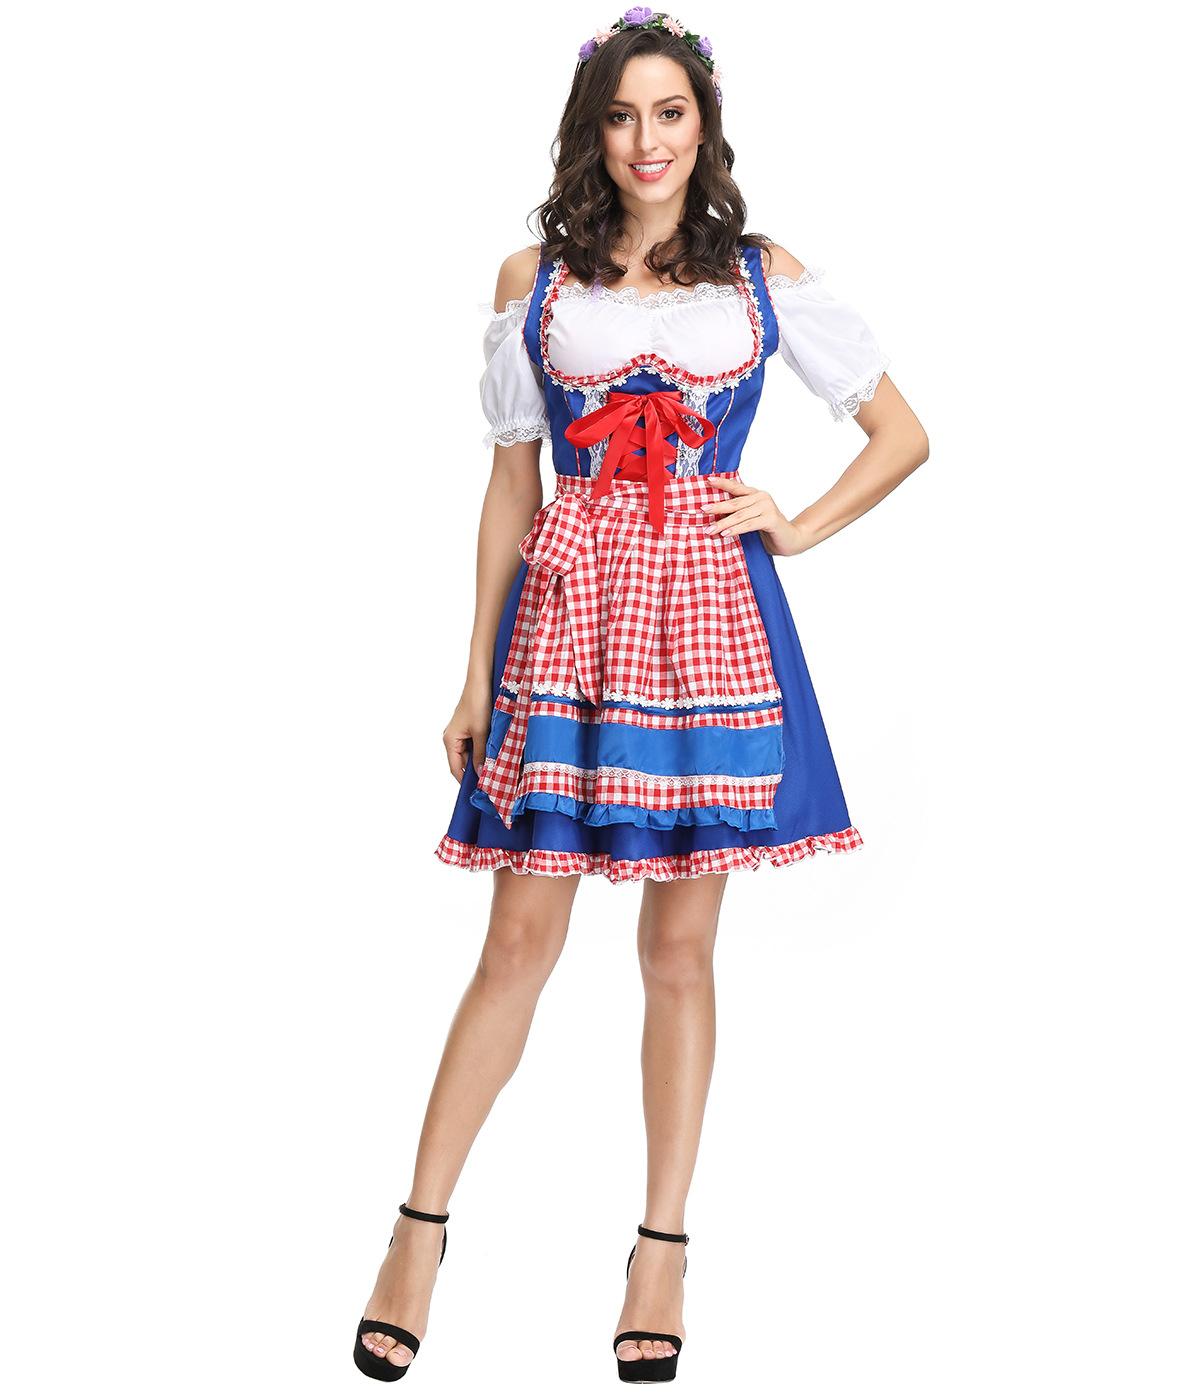 Women Oktoberfest Dirndl Off-shoulder Maid Cosplay Dress Costume Beer Festival Dress blue_M